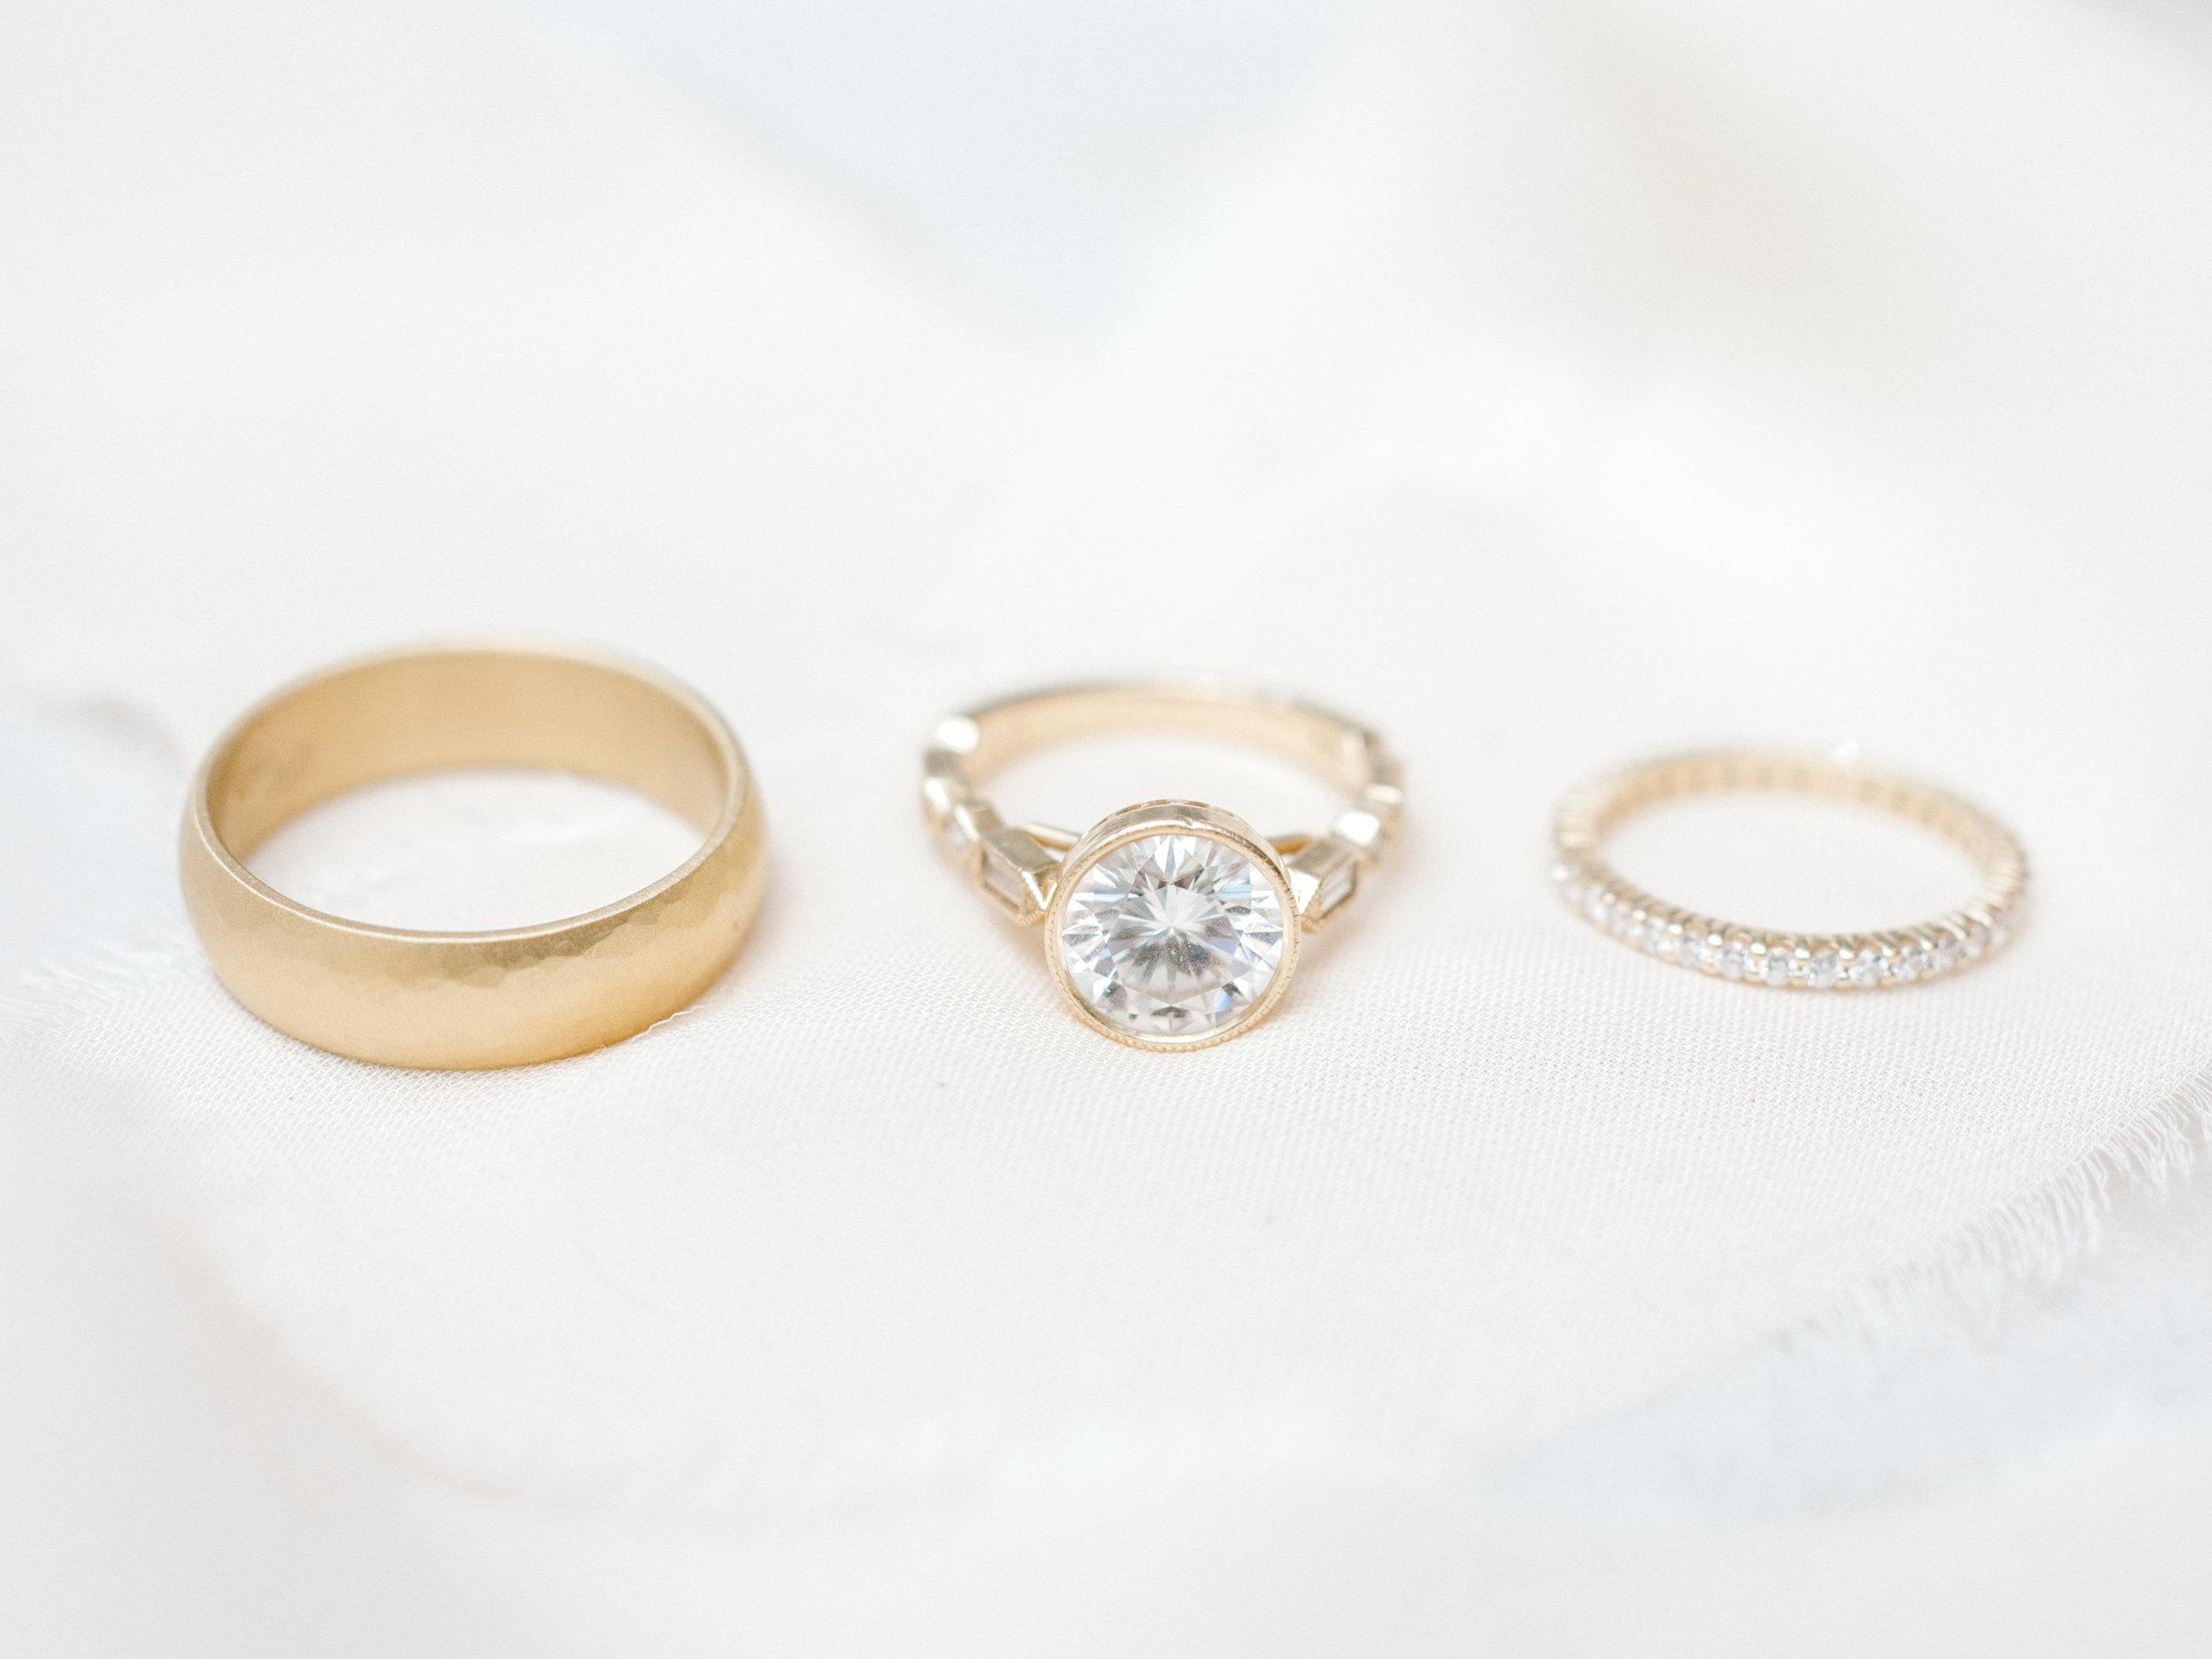 Modern gold wedding rings. Large white circular diamond engagement ring with modern gold fitting.